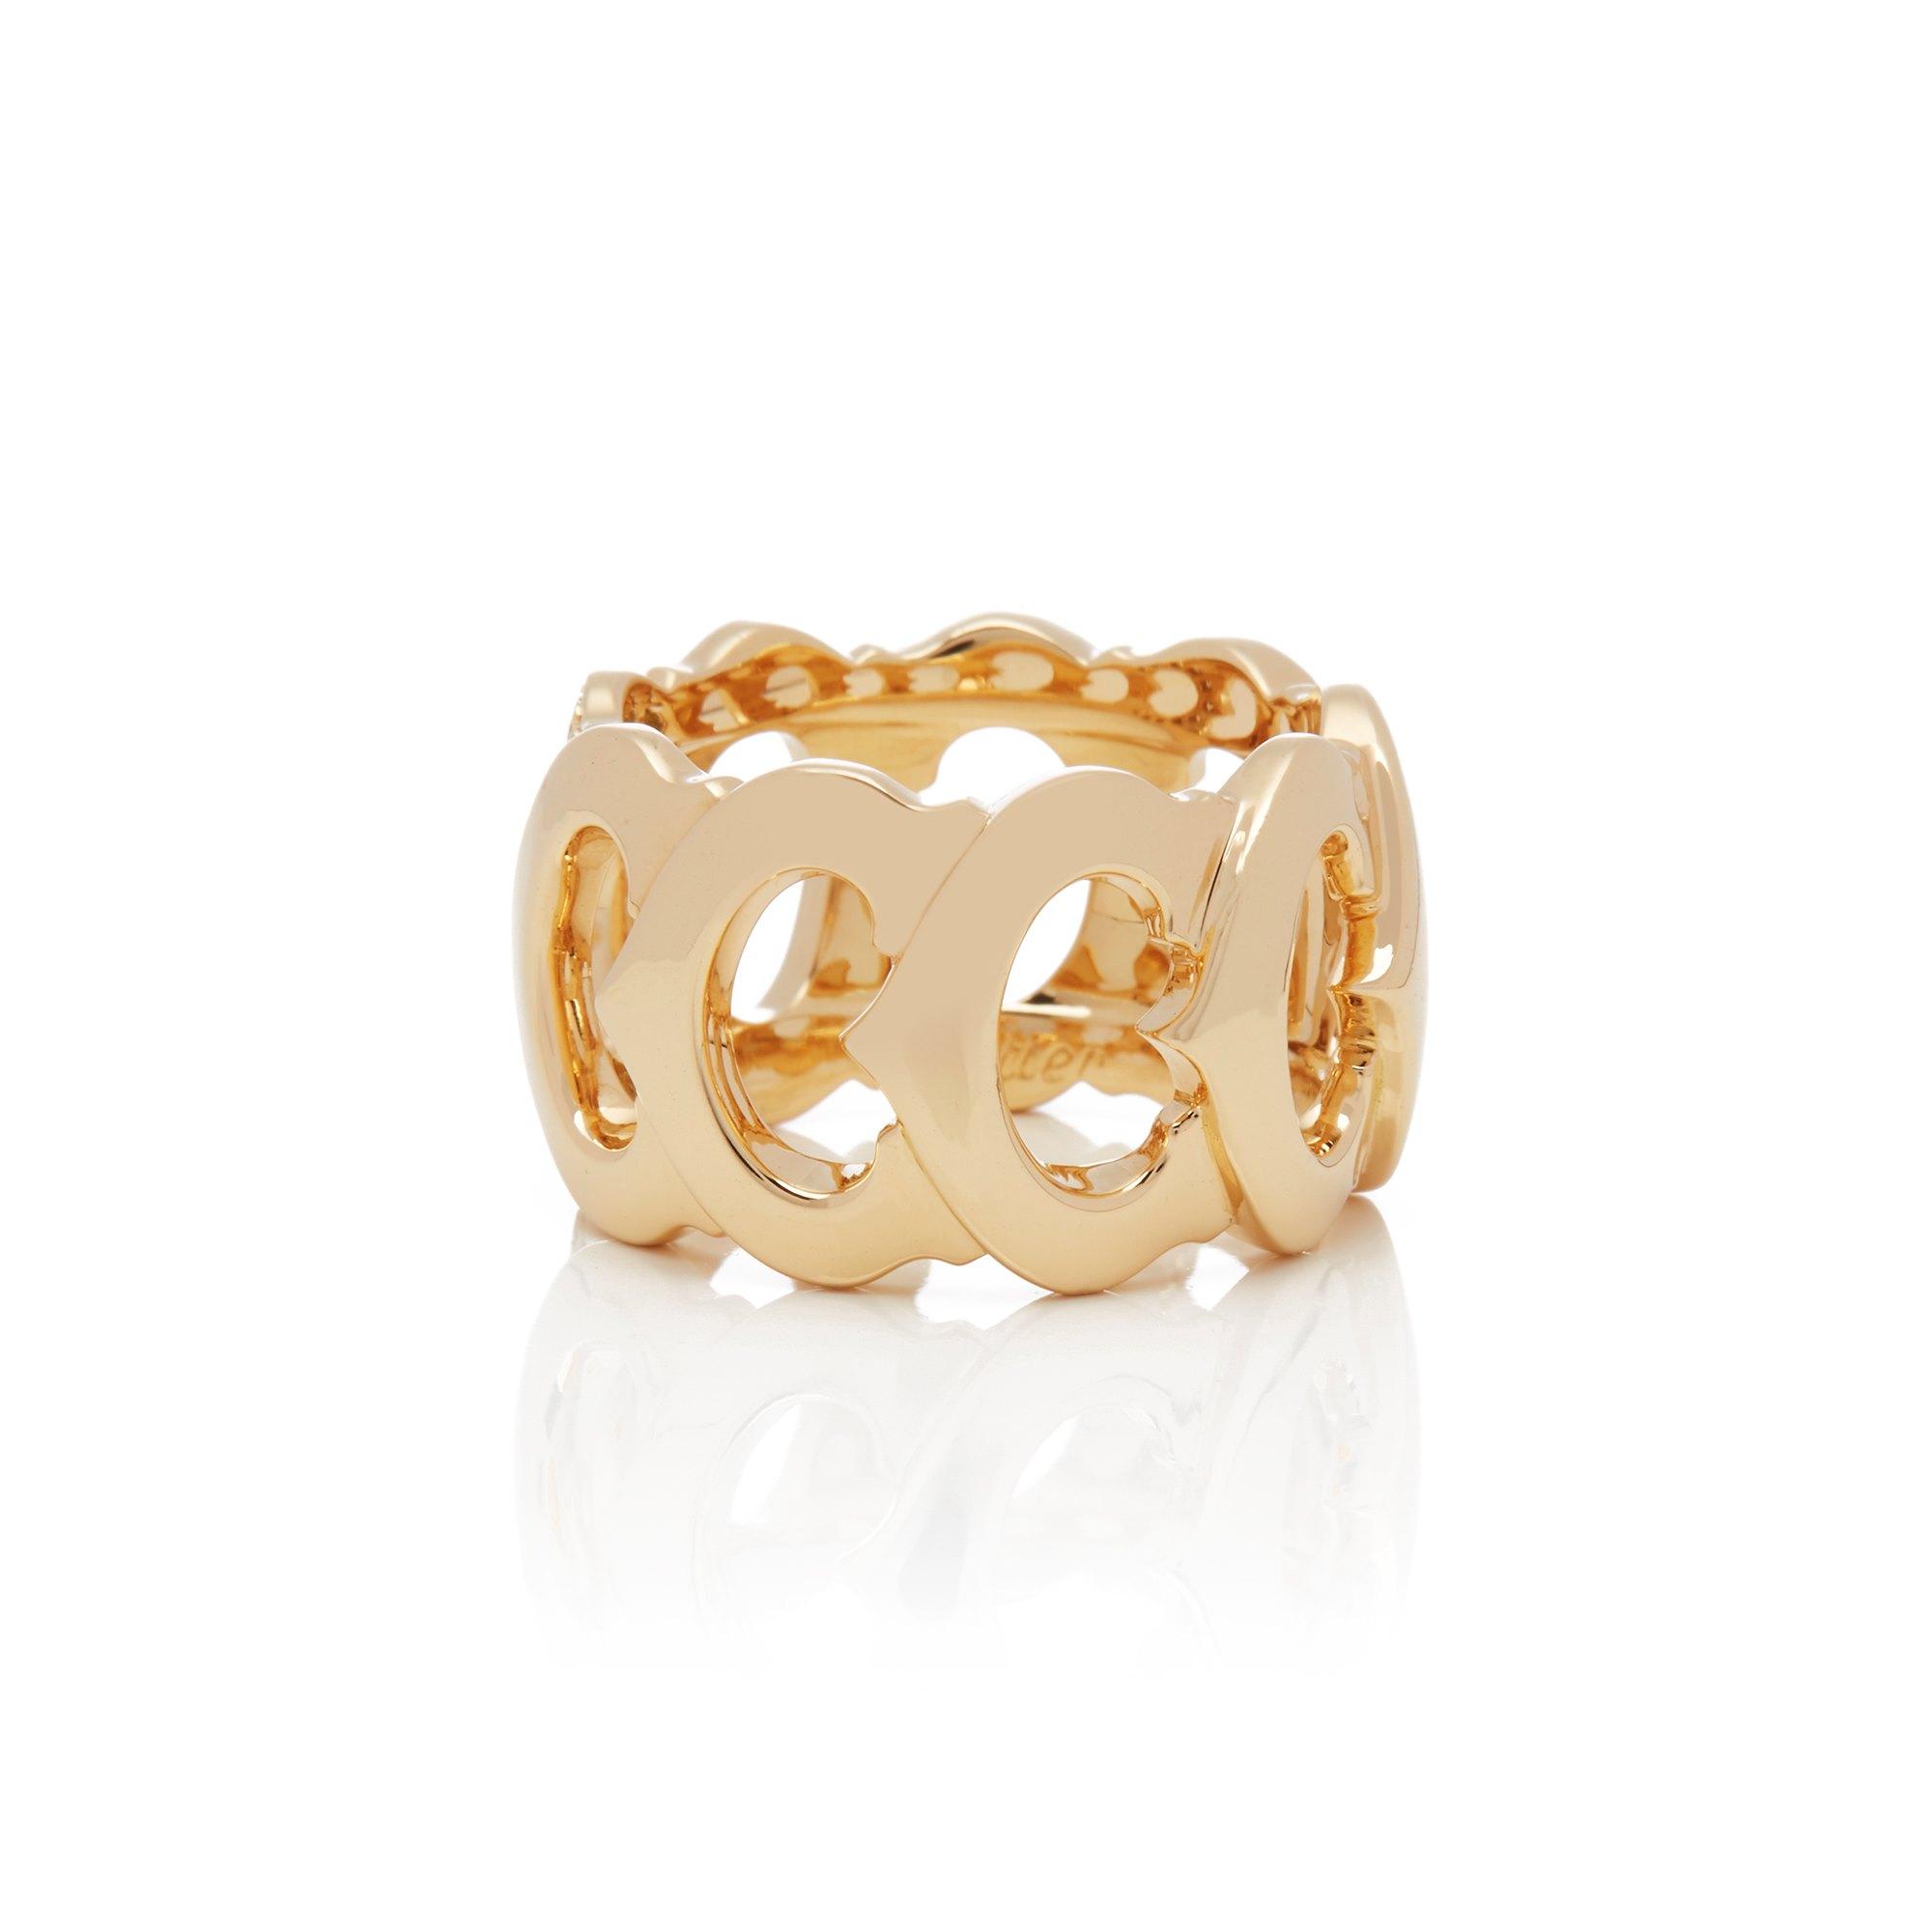 Cartier 18k Yellow Gold Signature CC Ring